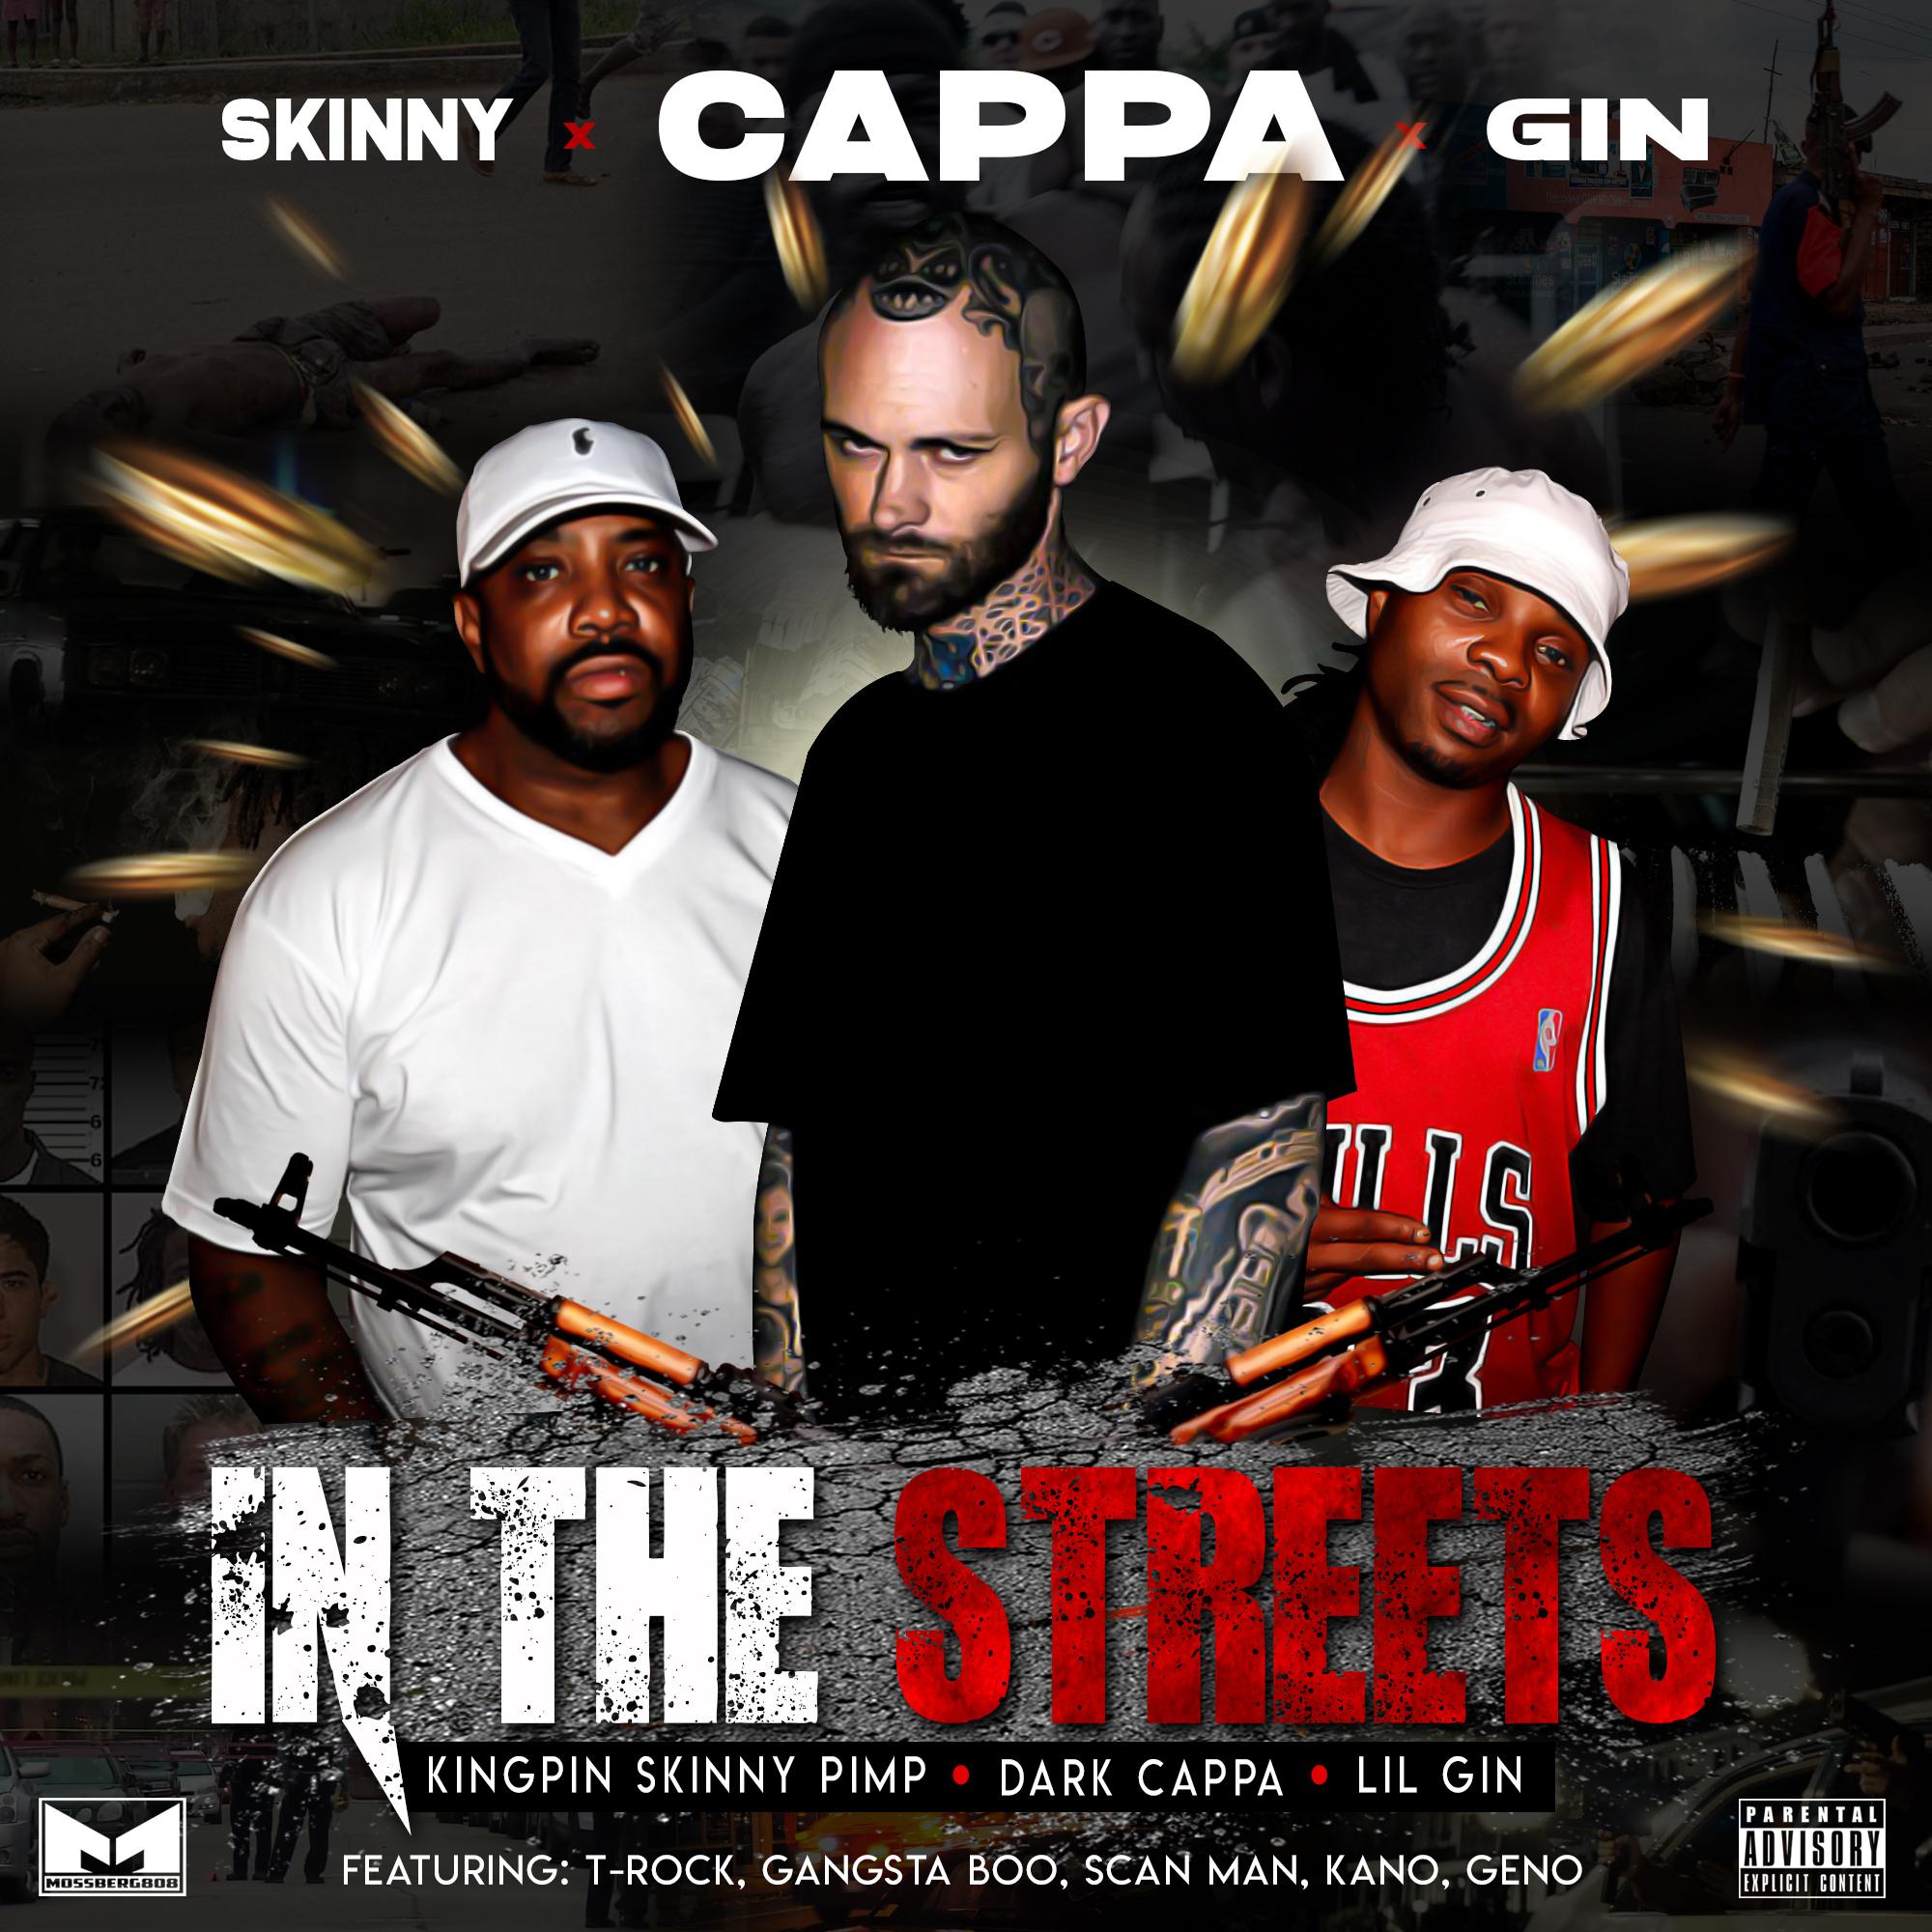 Kingpin Skinny Pimp x Dark Cappa x Lil Gin - In the Streets